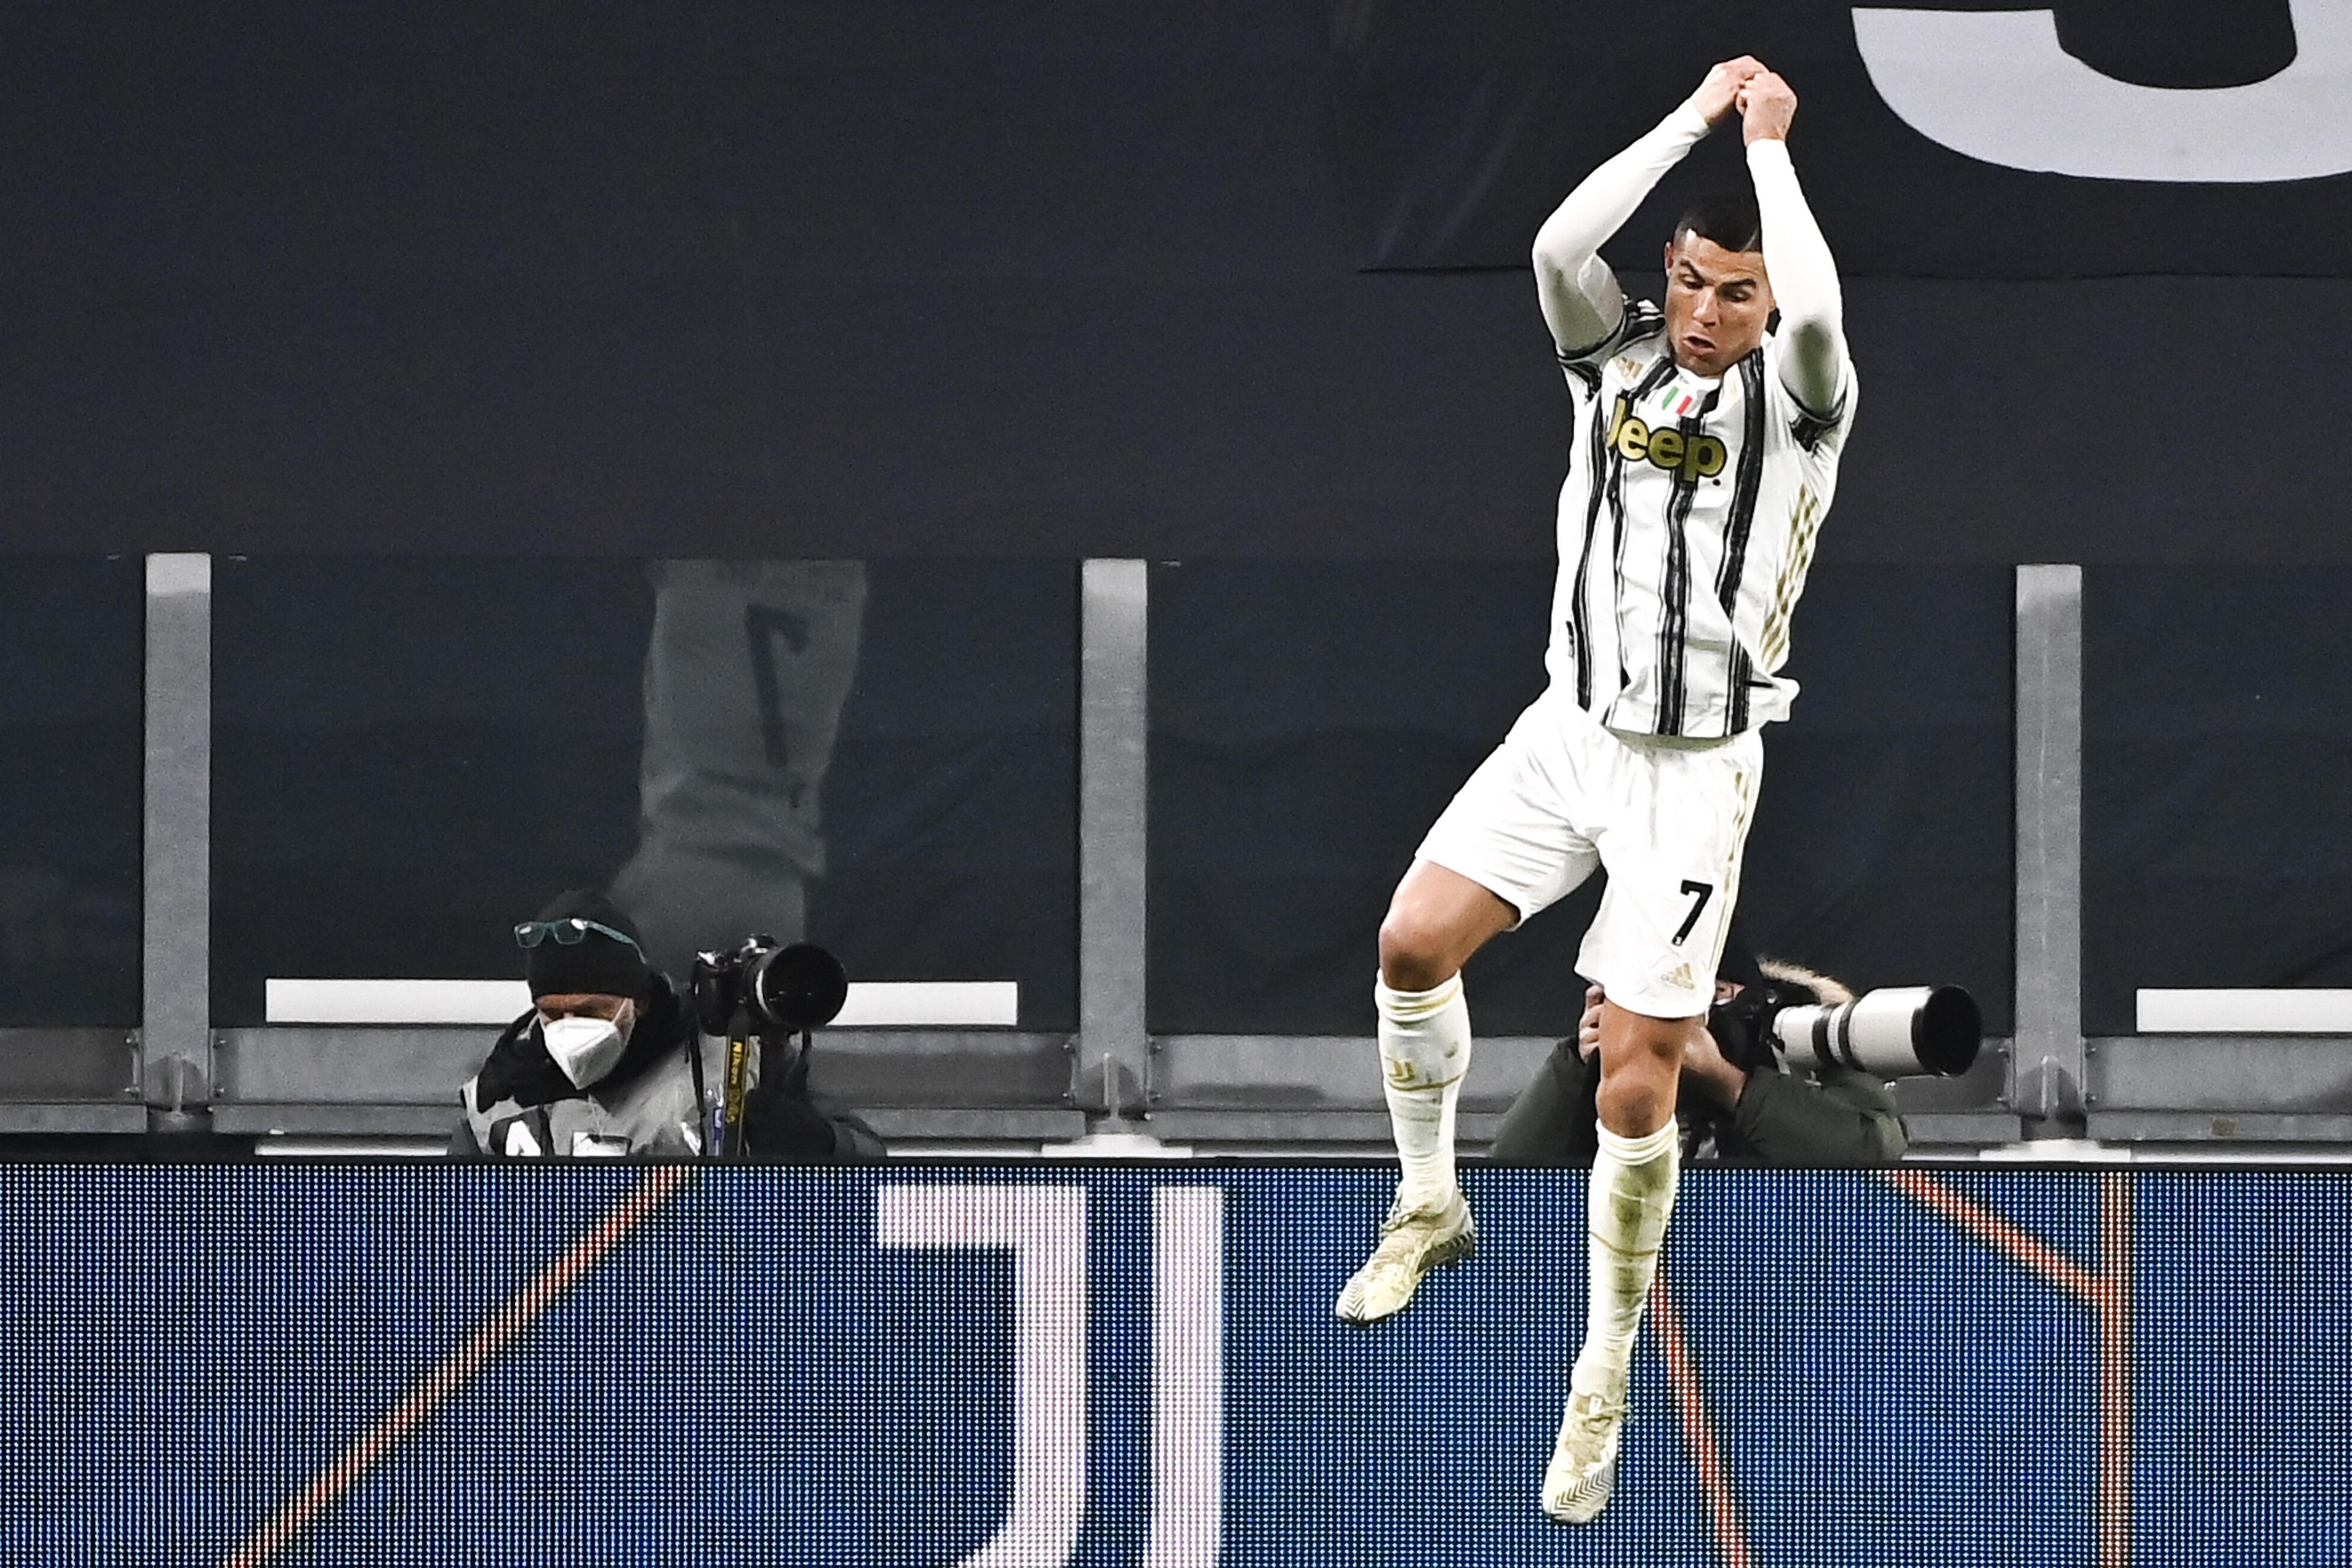 Juventus Vs Napoli Free Live Stream 1 20 21 Watch Supercoppa Italiana Online Time Usa Tv Channel Nj Com